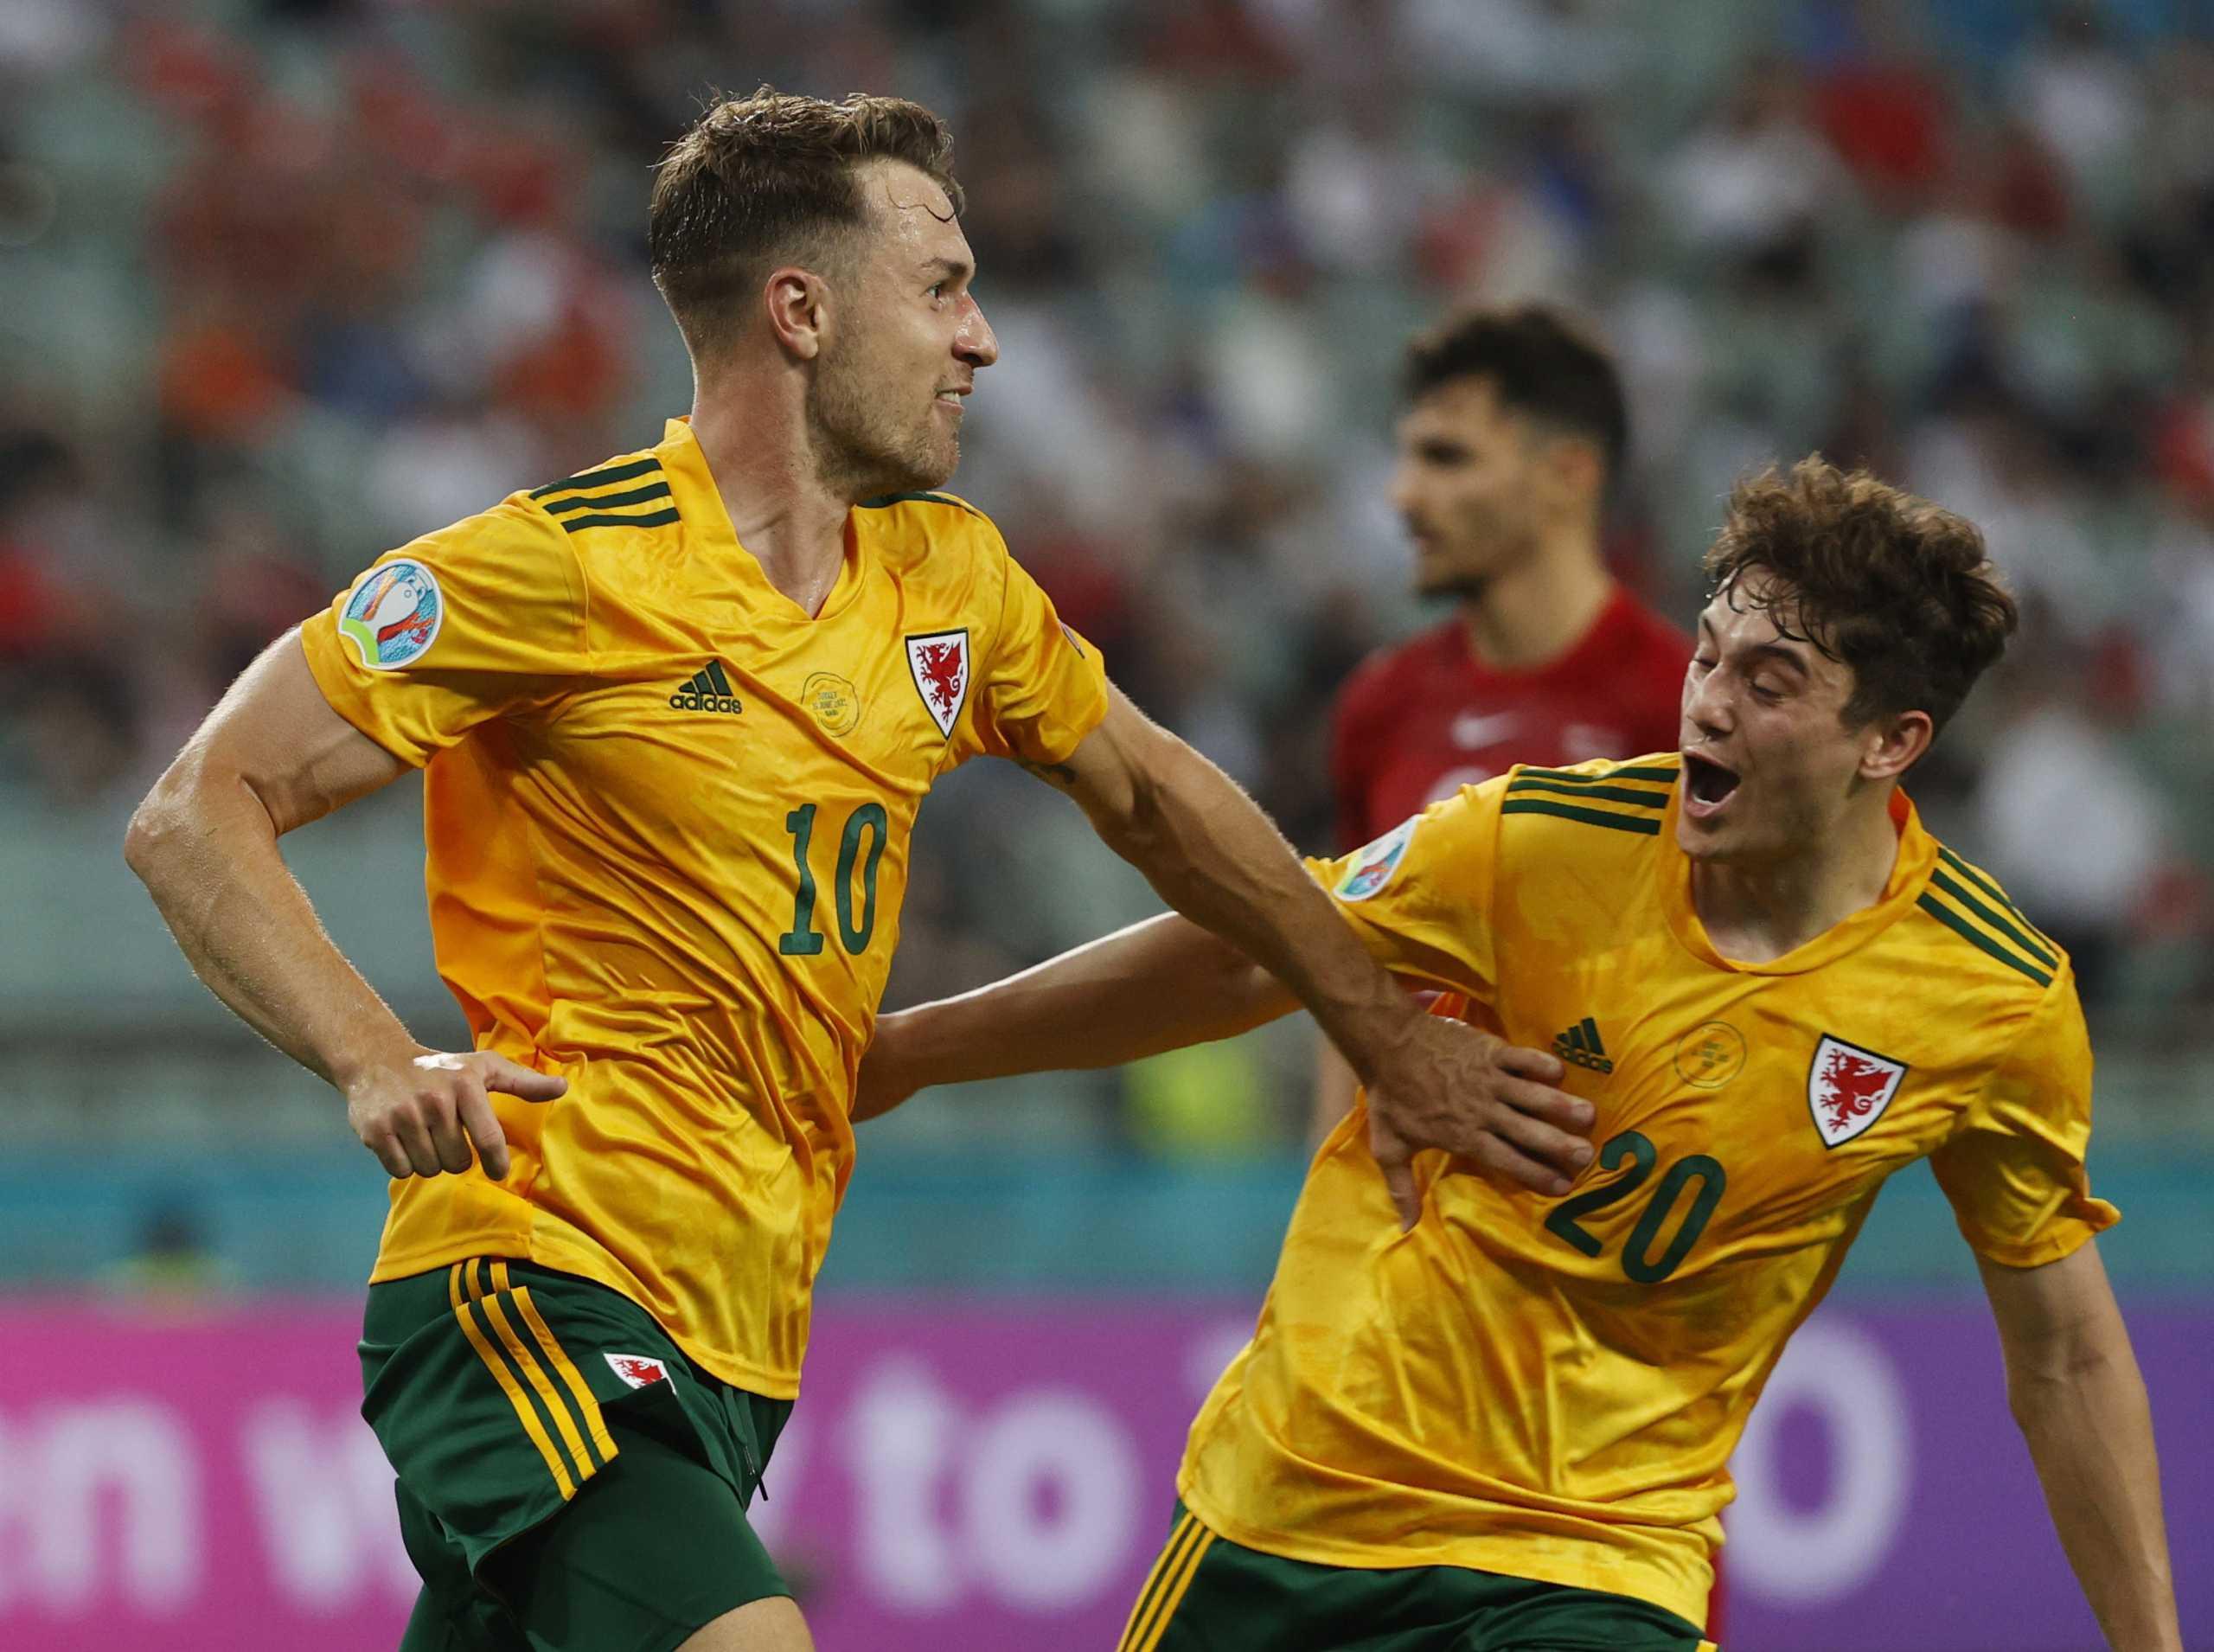 Euro 2020: Με γκολάρα Ράμσεϊ, οι Ουαλοί στέλνουν στο καναβάτσο τους Τούρκους